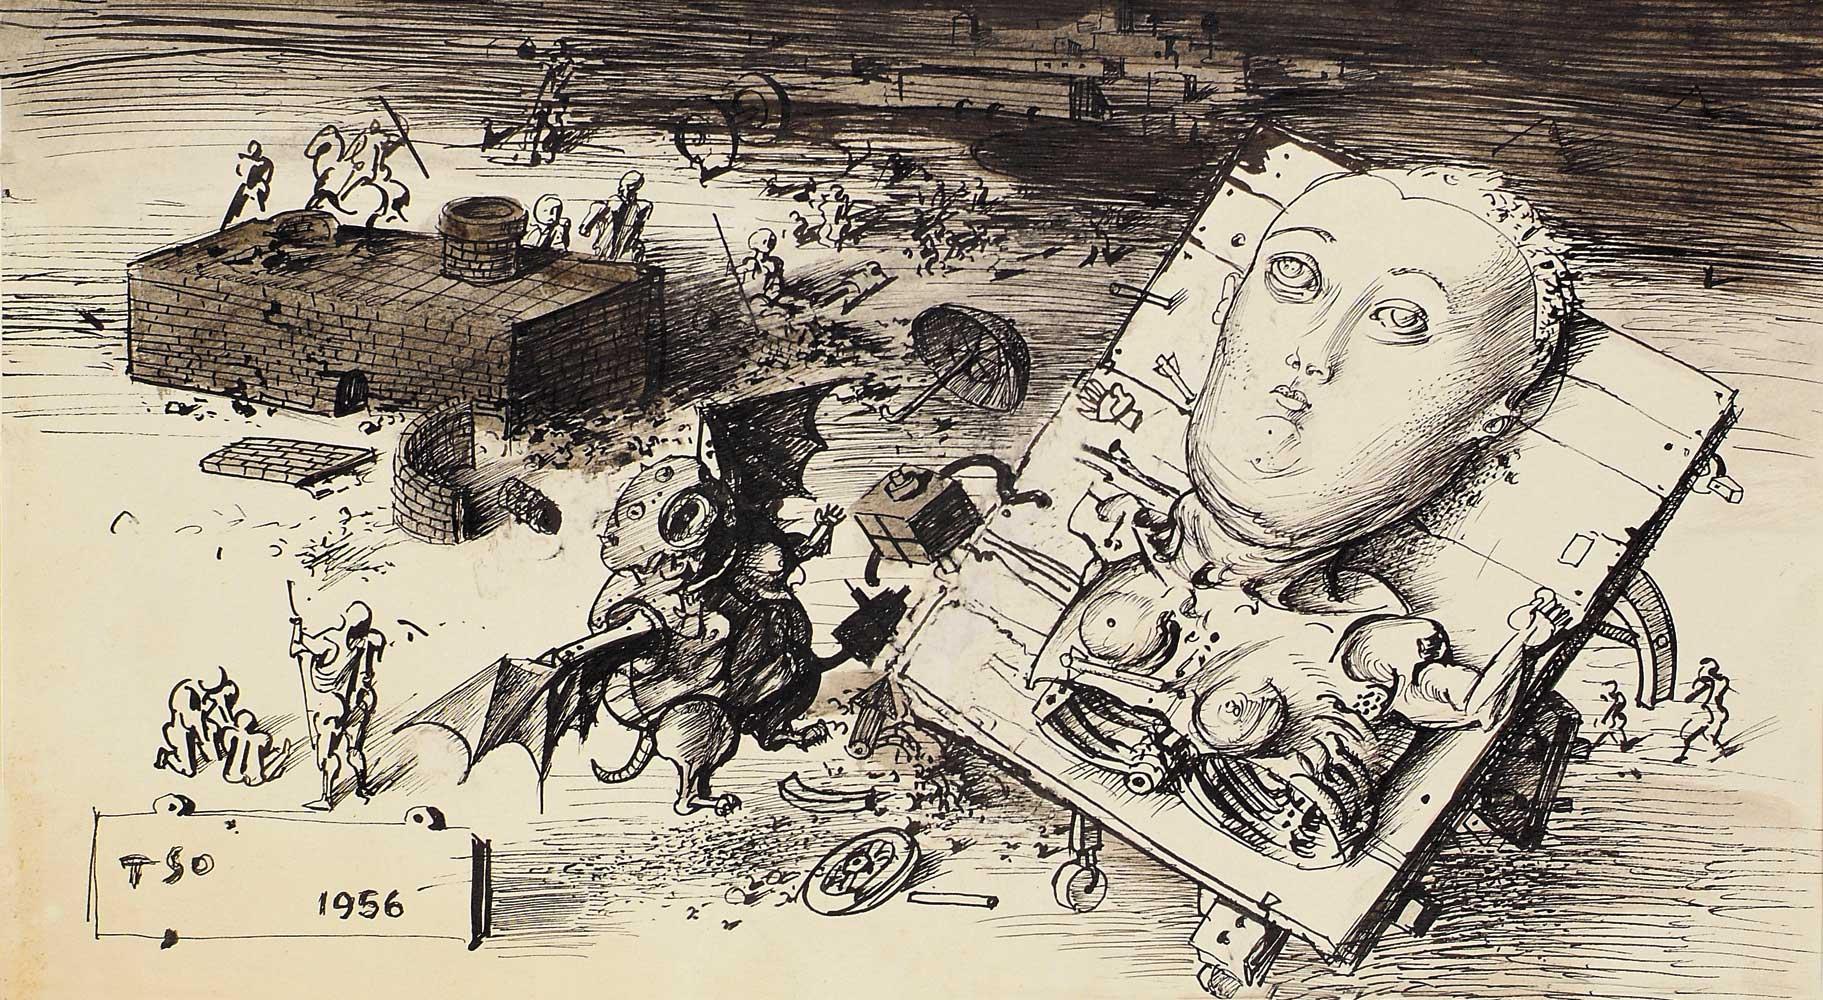 Dado's drawing: Battlefield, 1956